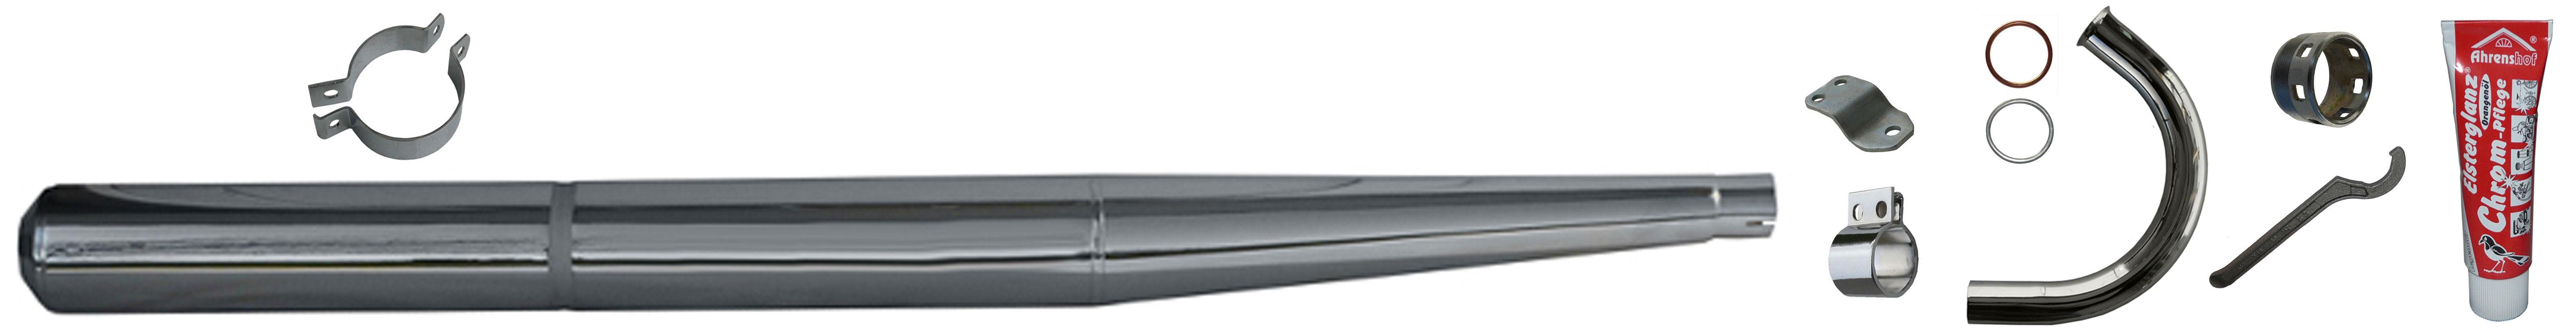 MZ TS 250/0 MZ TS 250/1 Ersatzteile Auspuffanlage